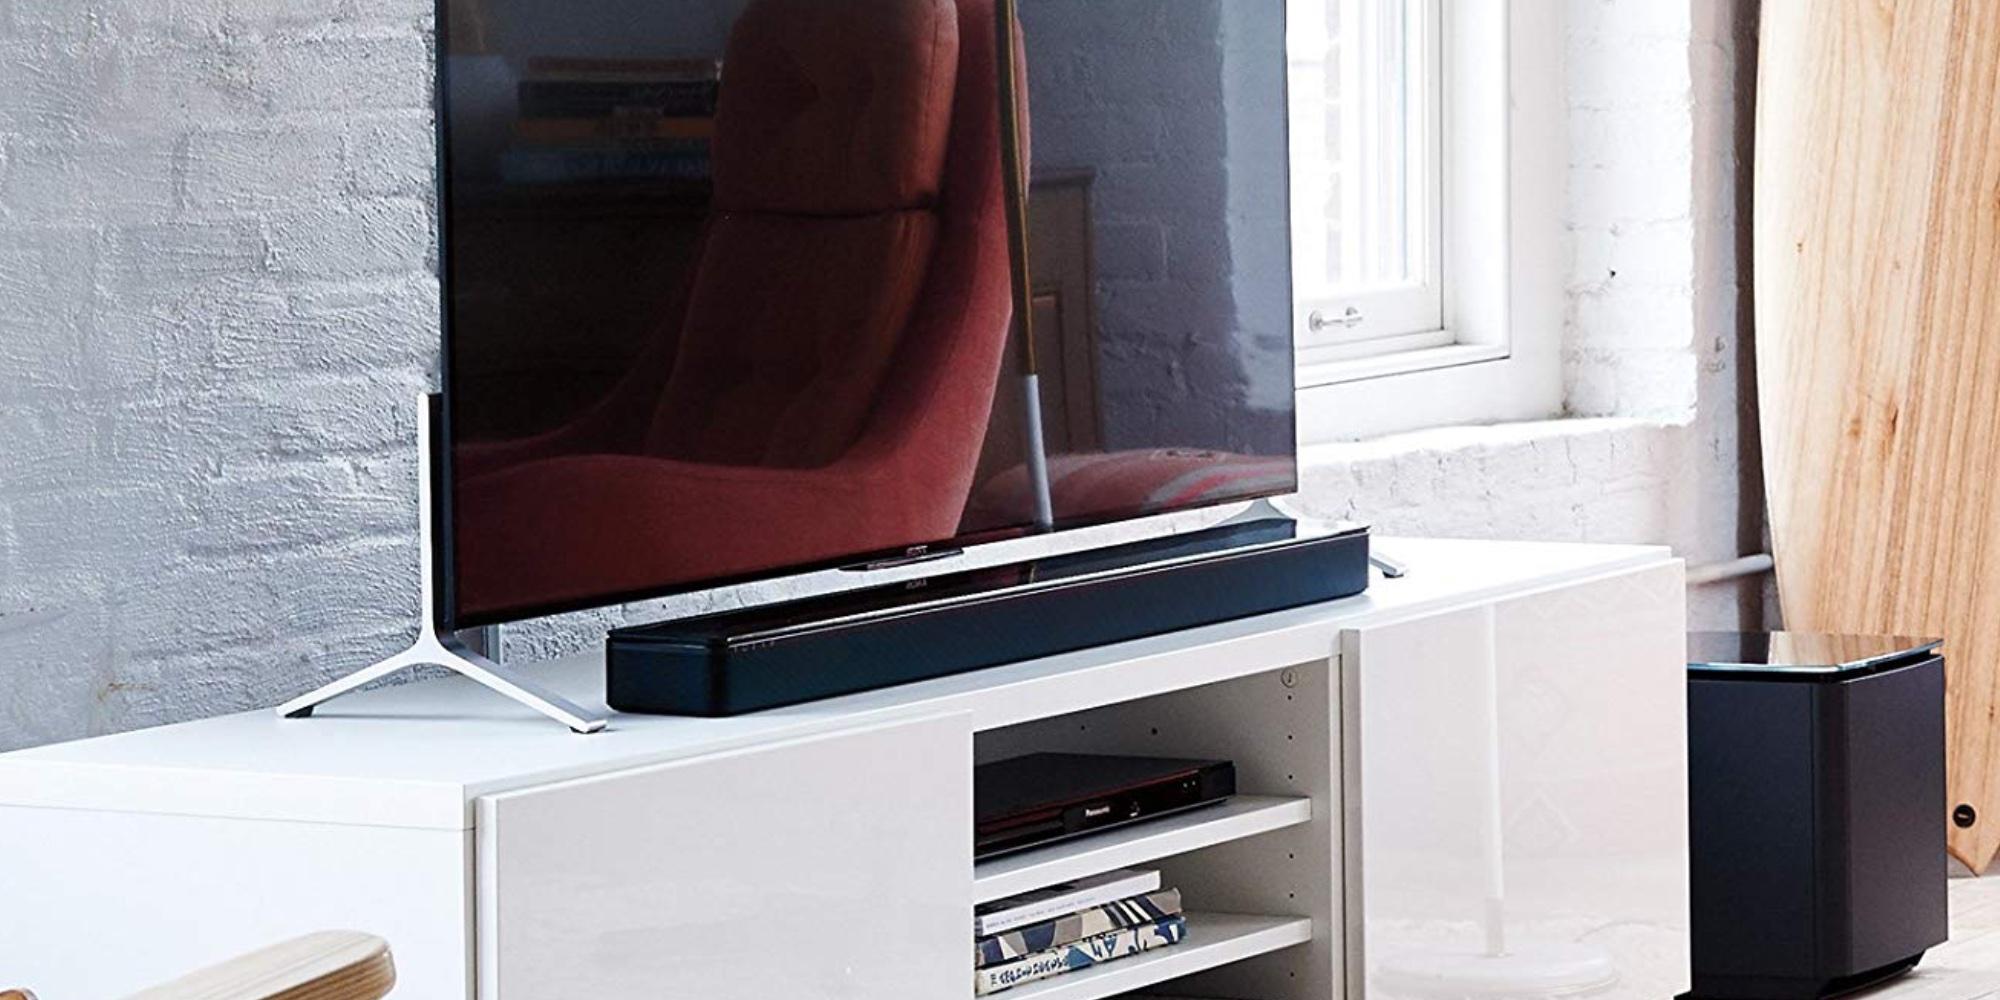 Control the Bose SoundTouch 300 Soundbar with Alexa at $499 shipped (Reg. $699)